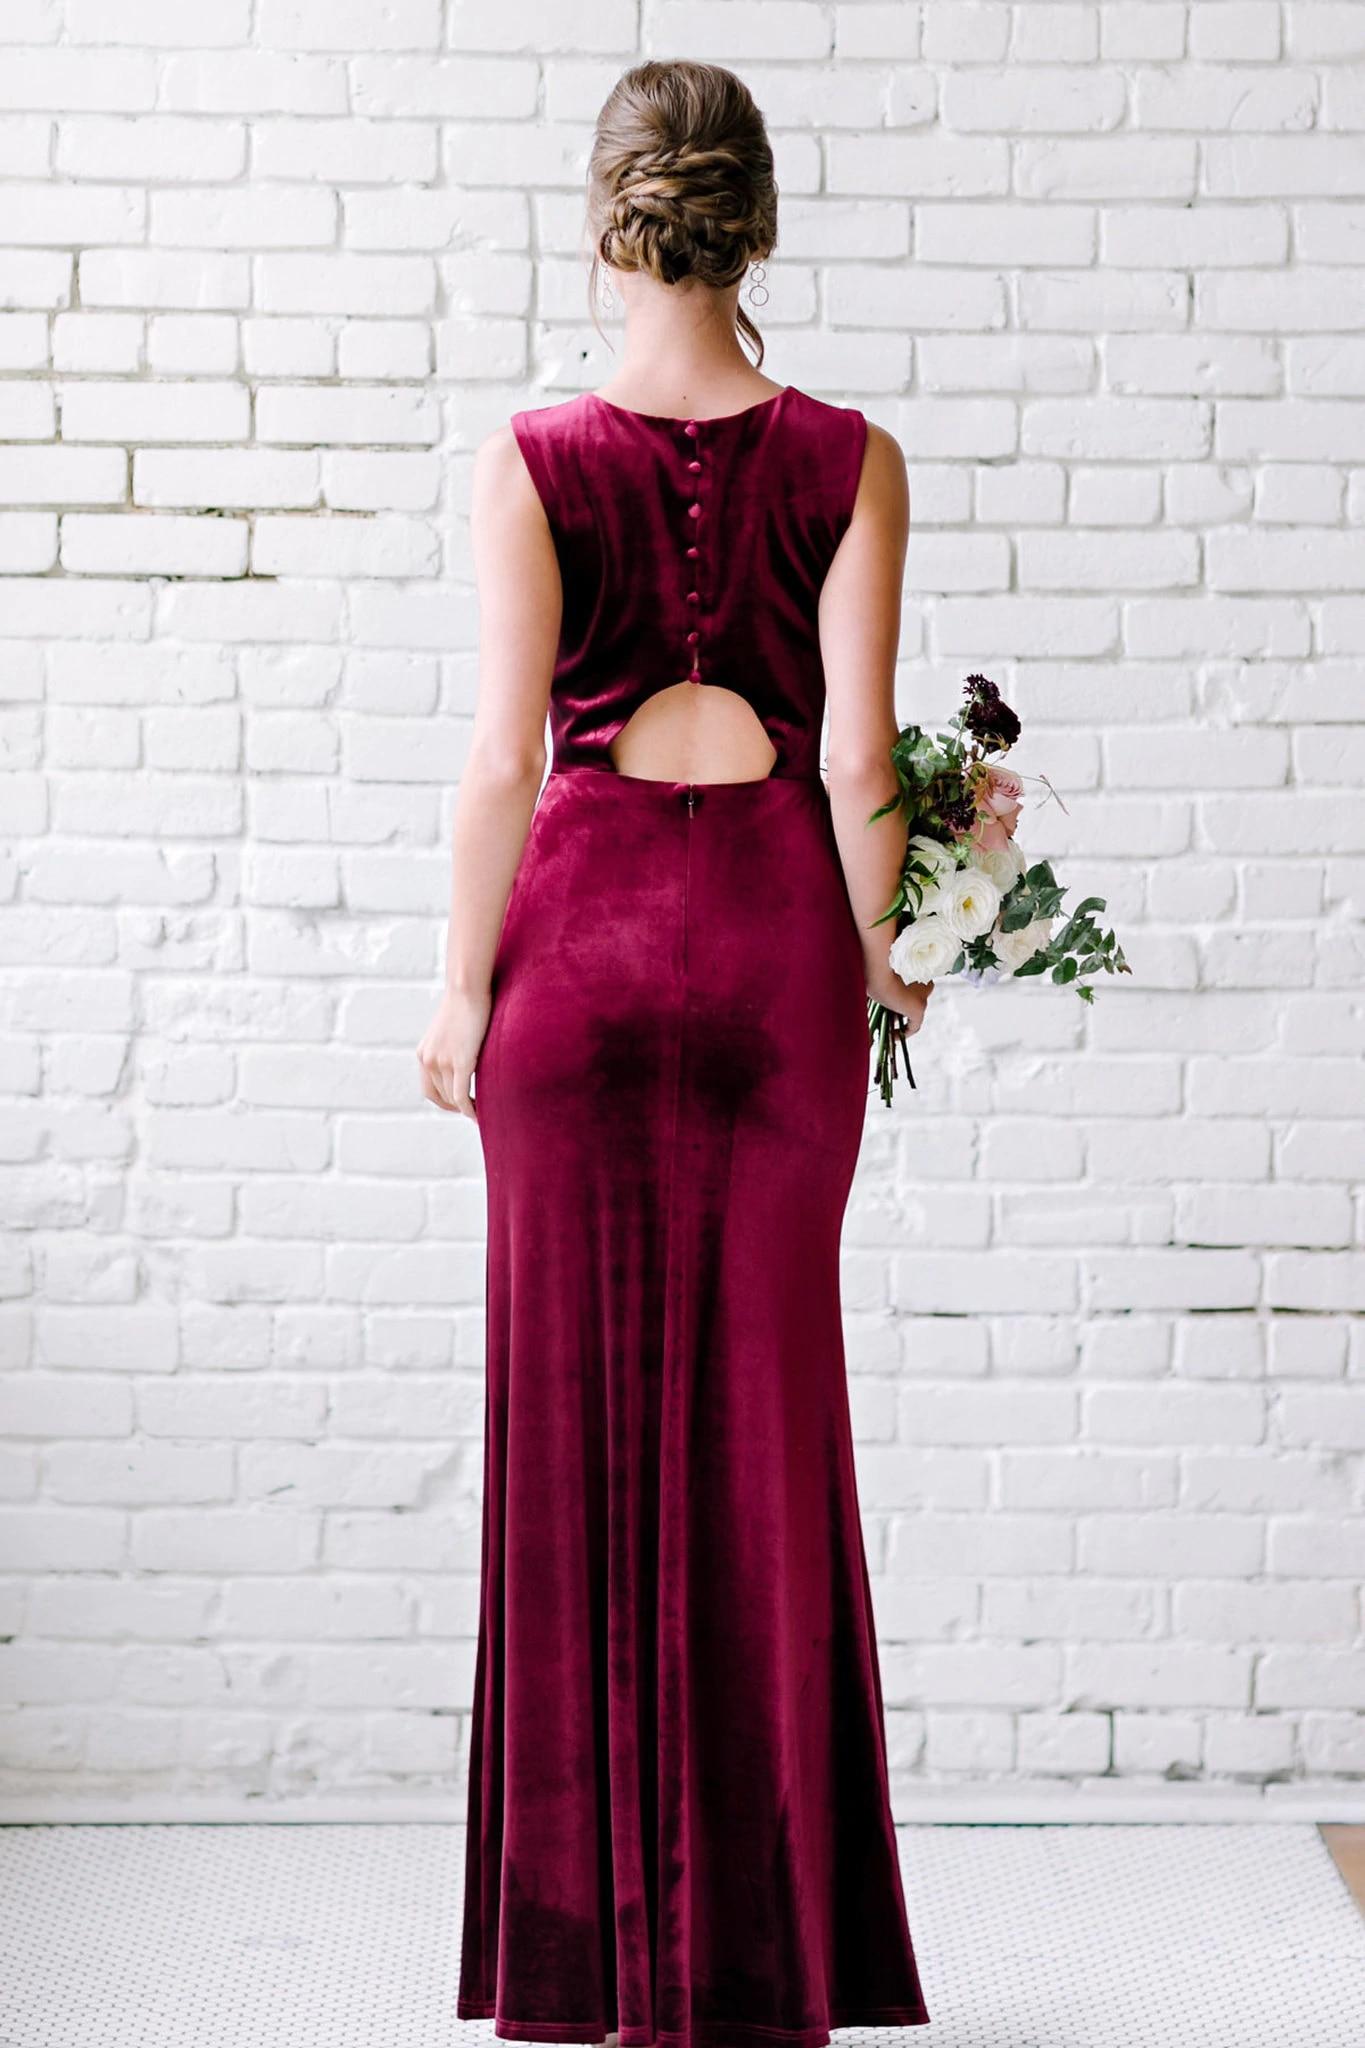 Burgundy Bridesmaid Dresses Long 2020 Velour Mermaid Vestido Madrinha Wedding Guest Dress Vestido De Festa